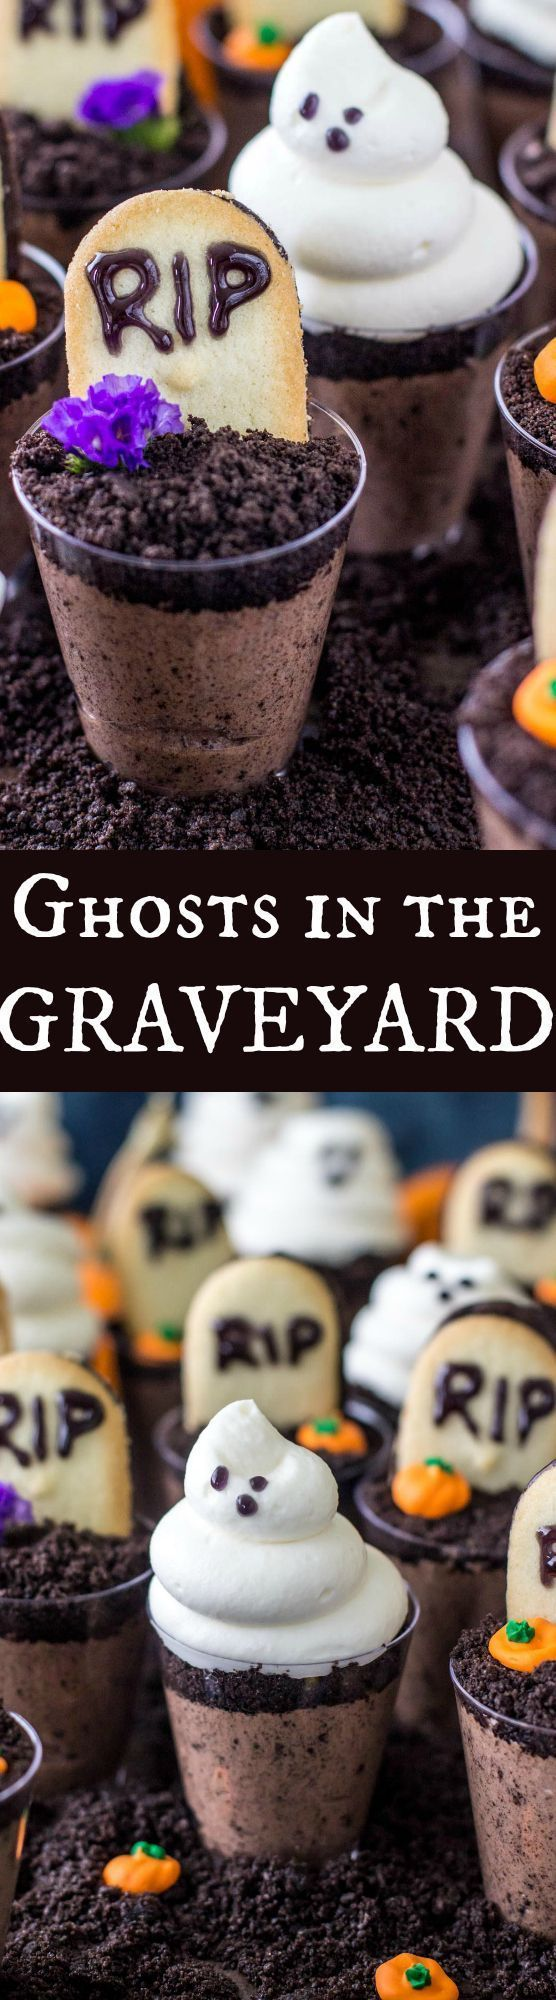 15 Incredible Halloween Dessert Ideas